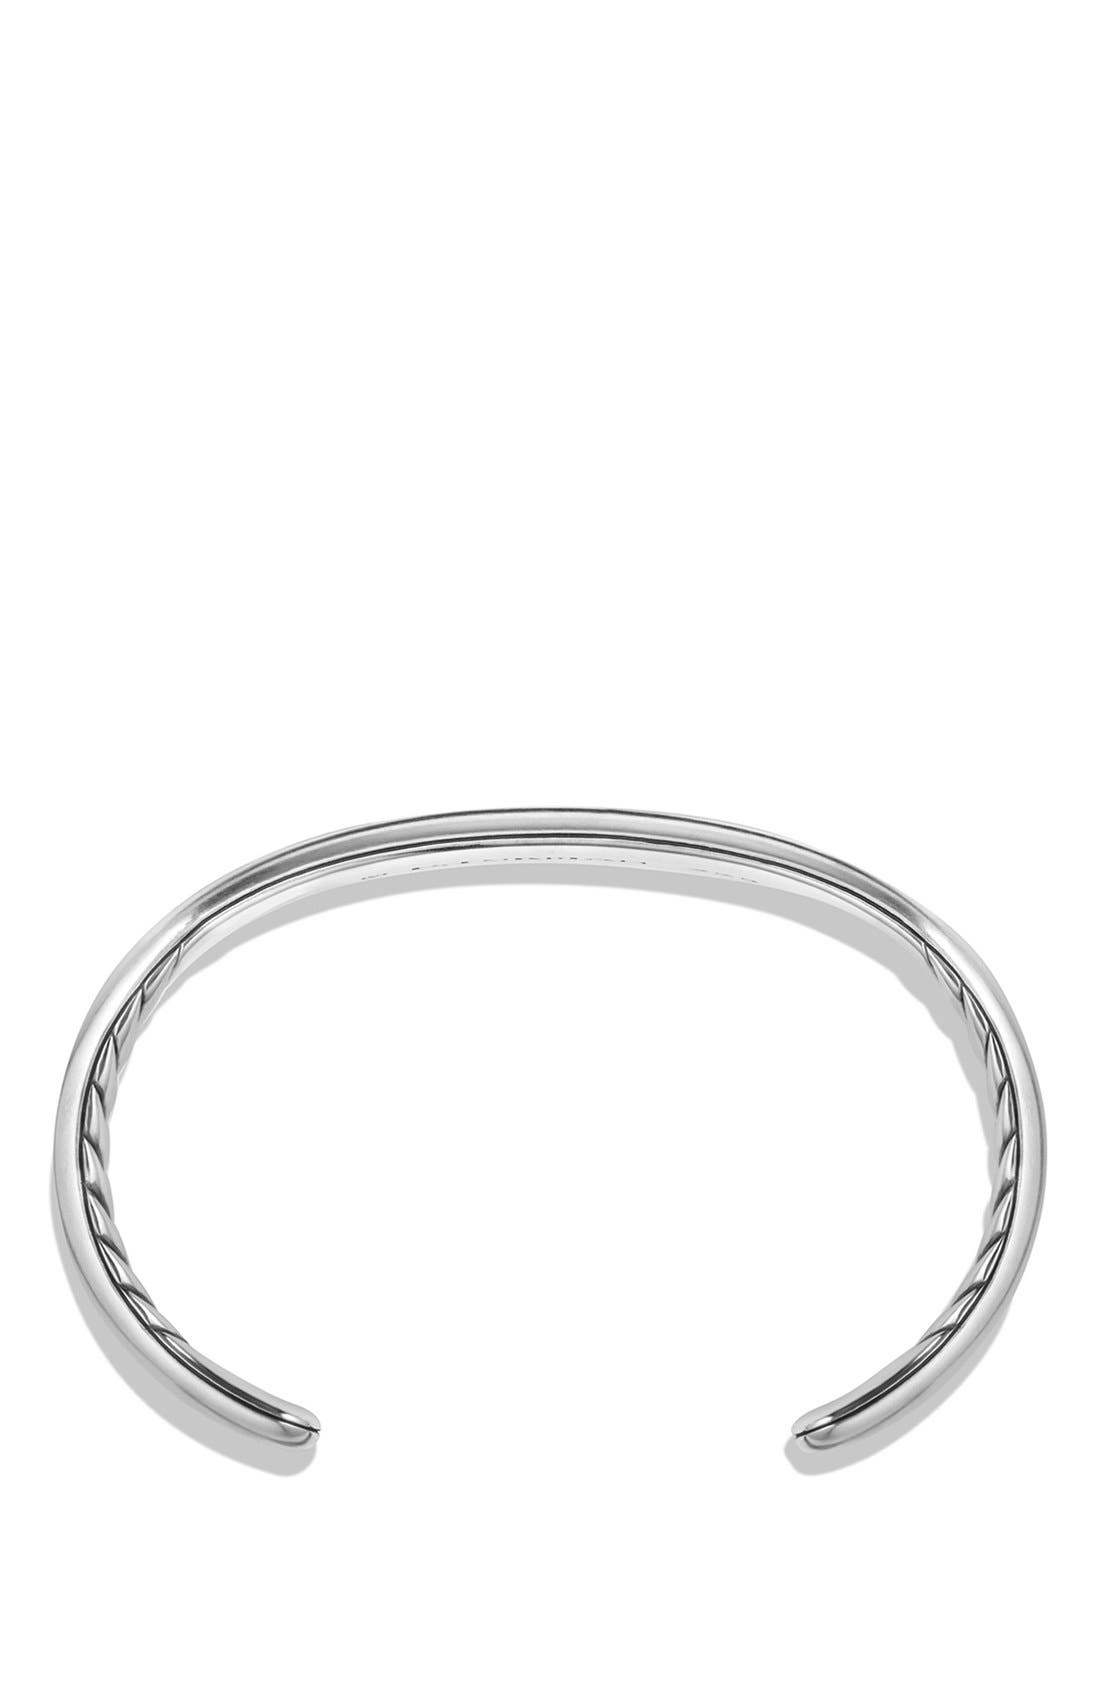 Alternate Image 2  - David Yurman 'Streamline' Cuff Bracelet